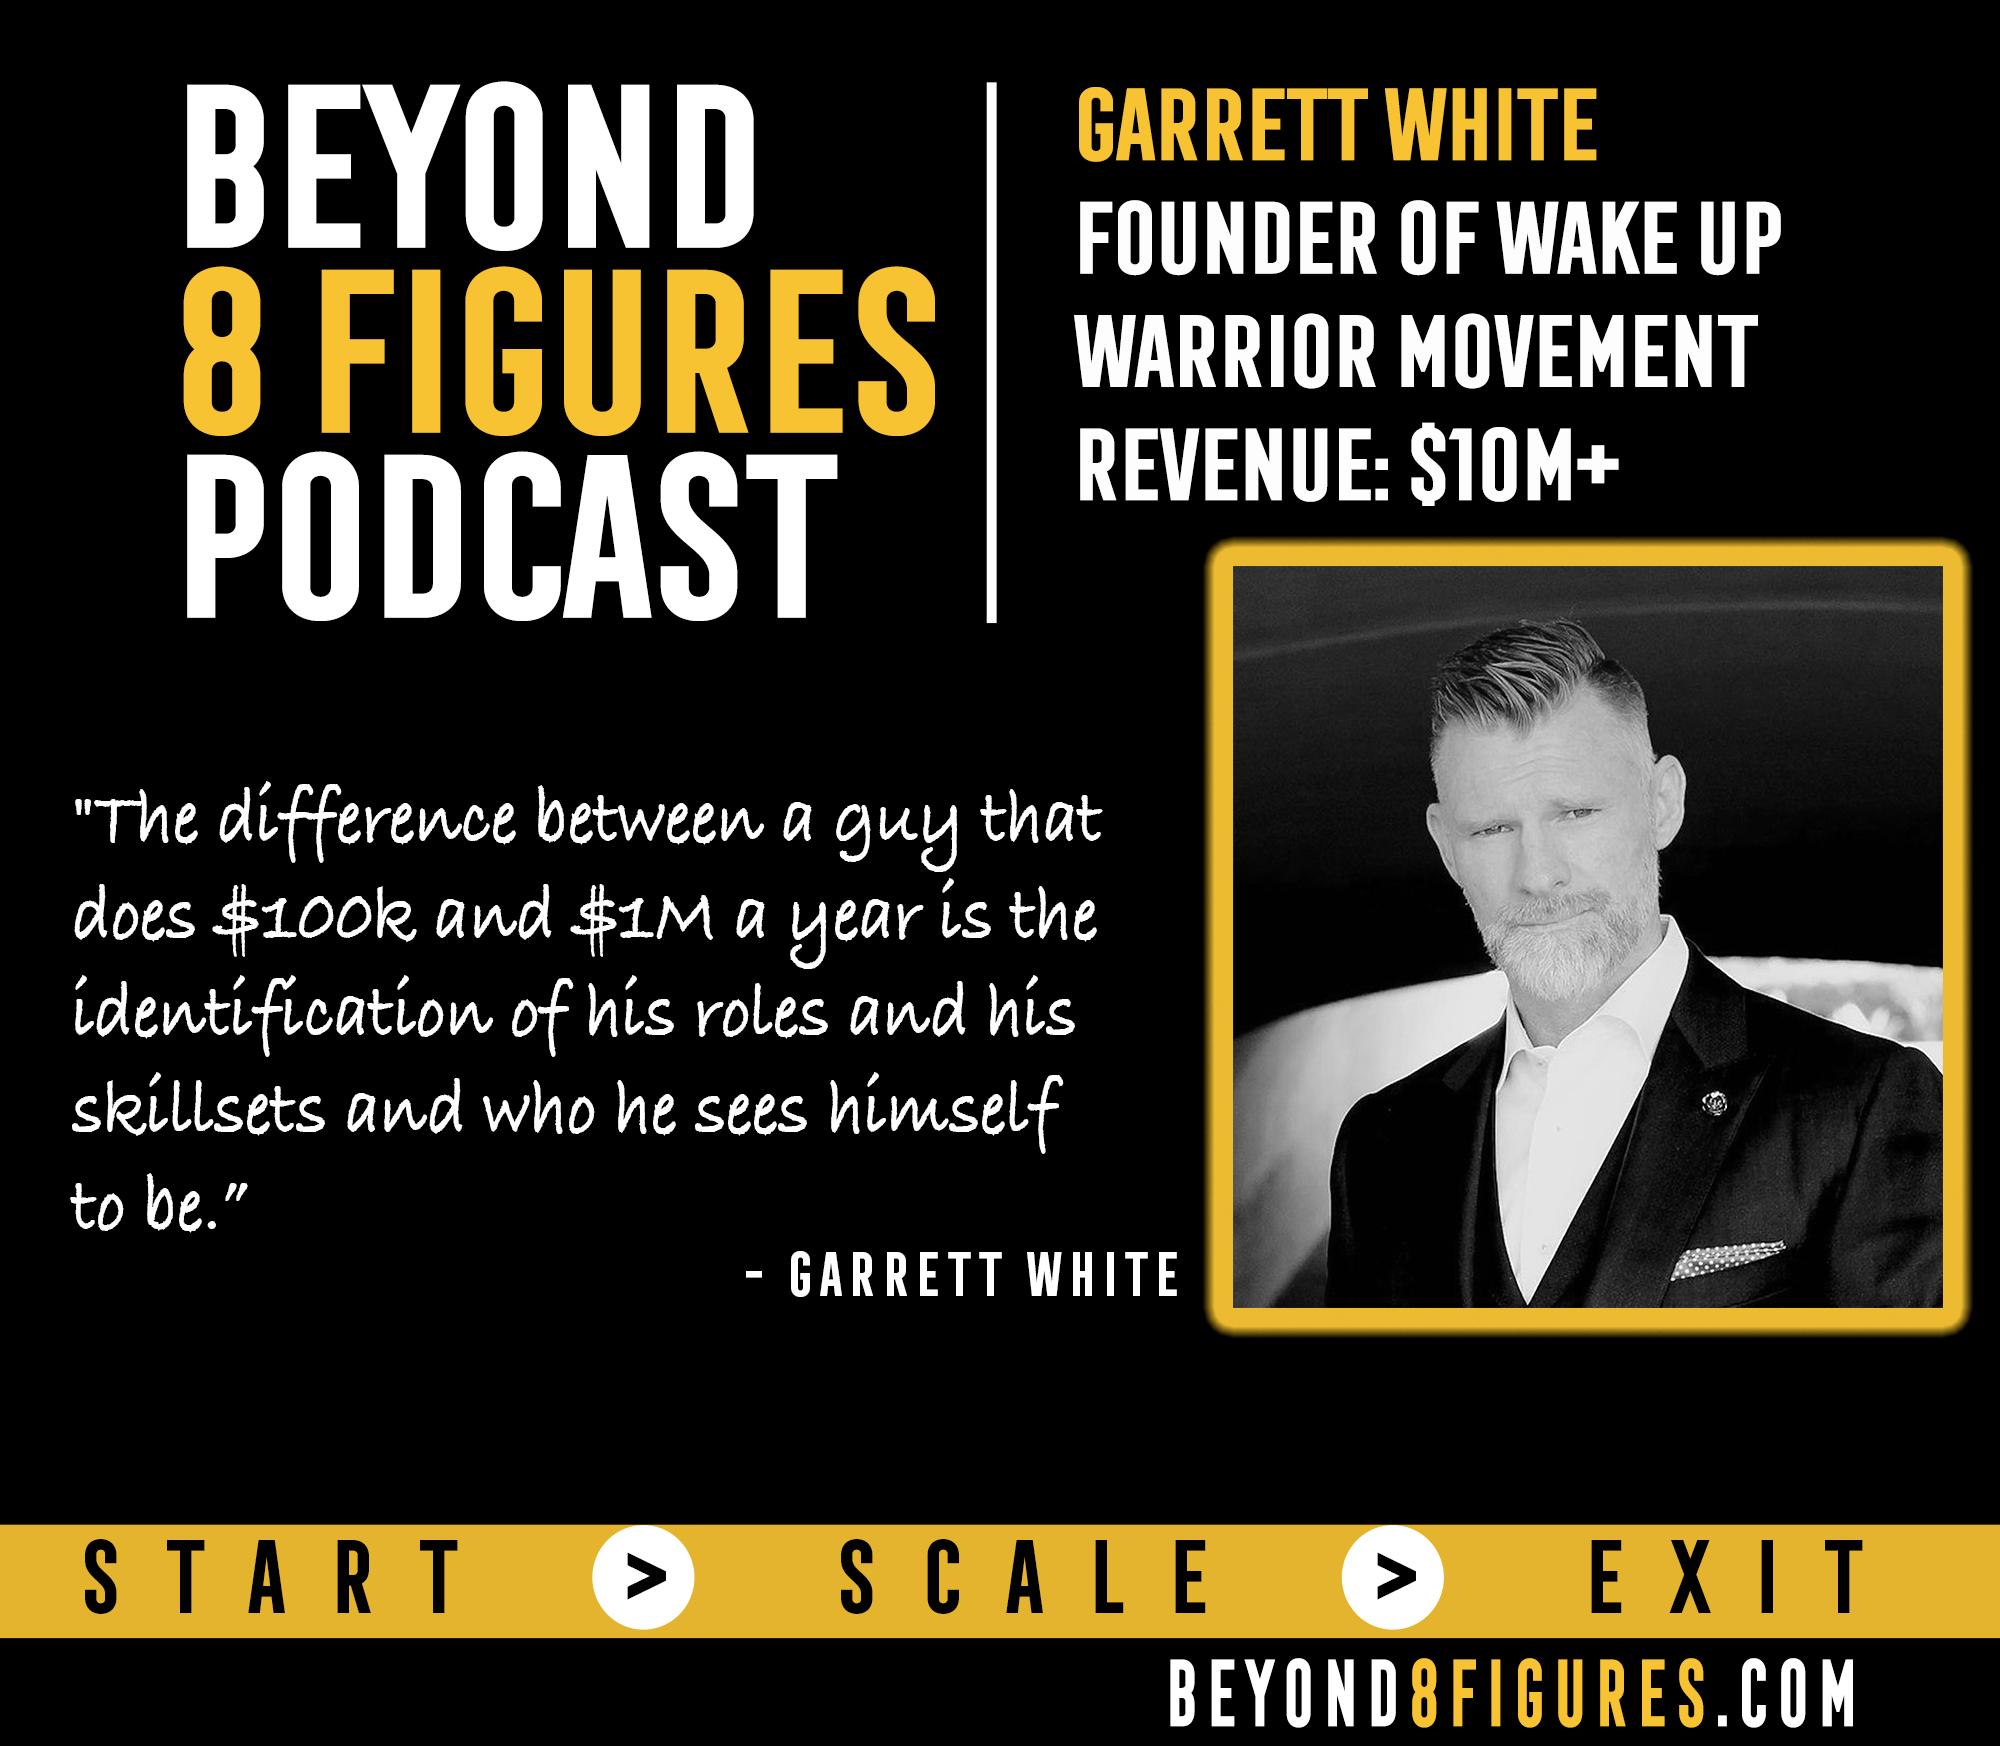 $10M+ in annual revenue – Garrett White Runs Wake Up Warrior Which Generates